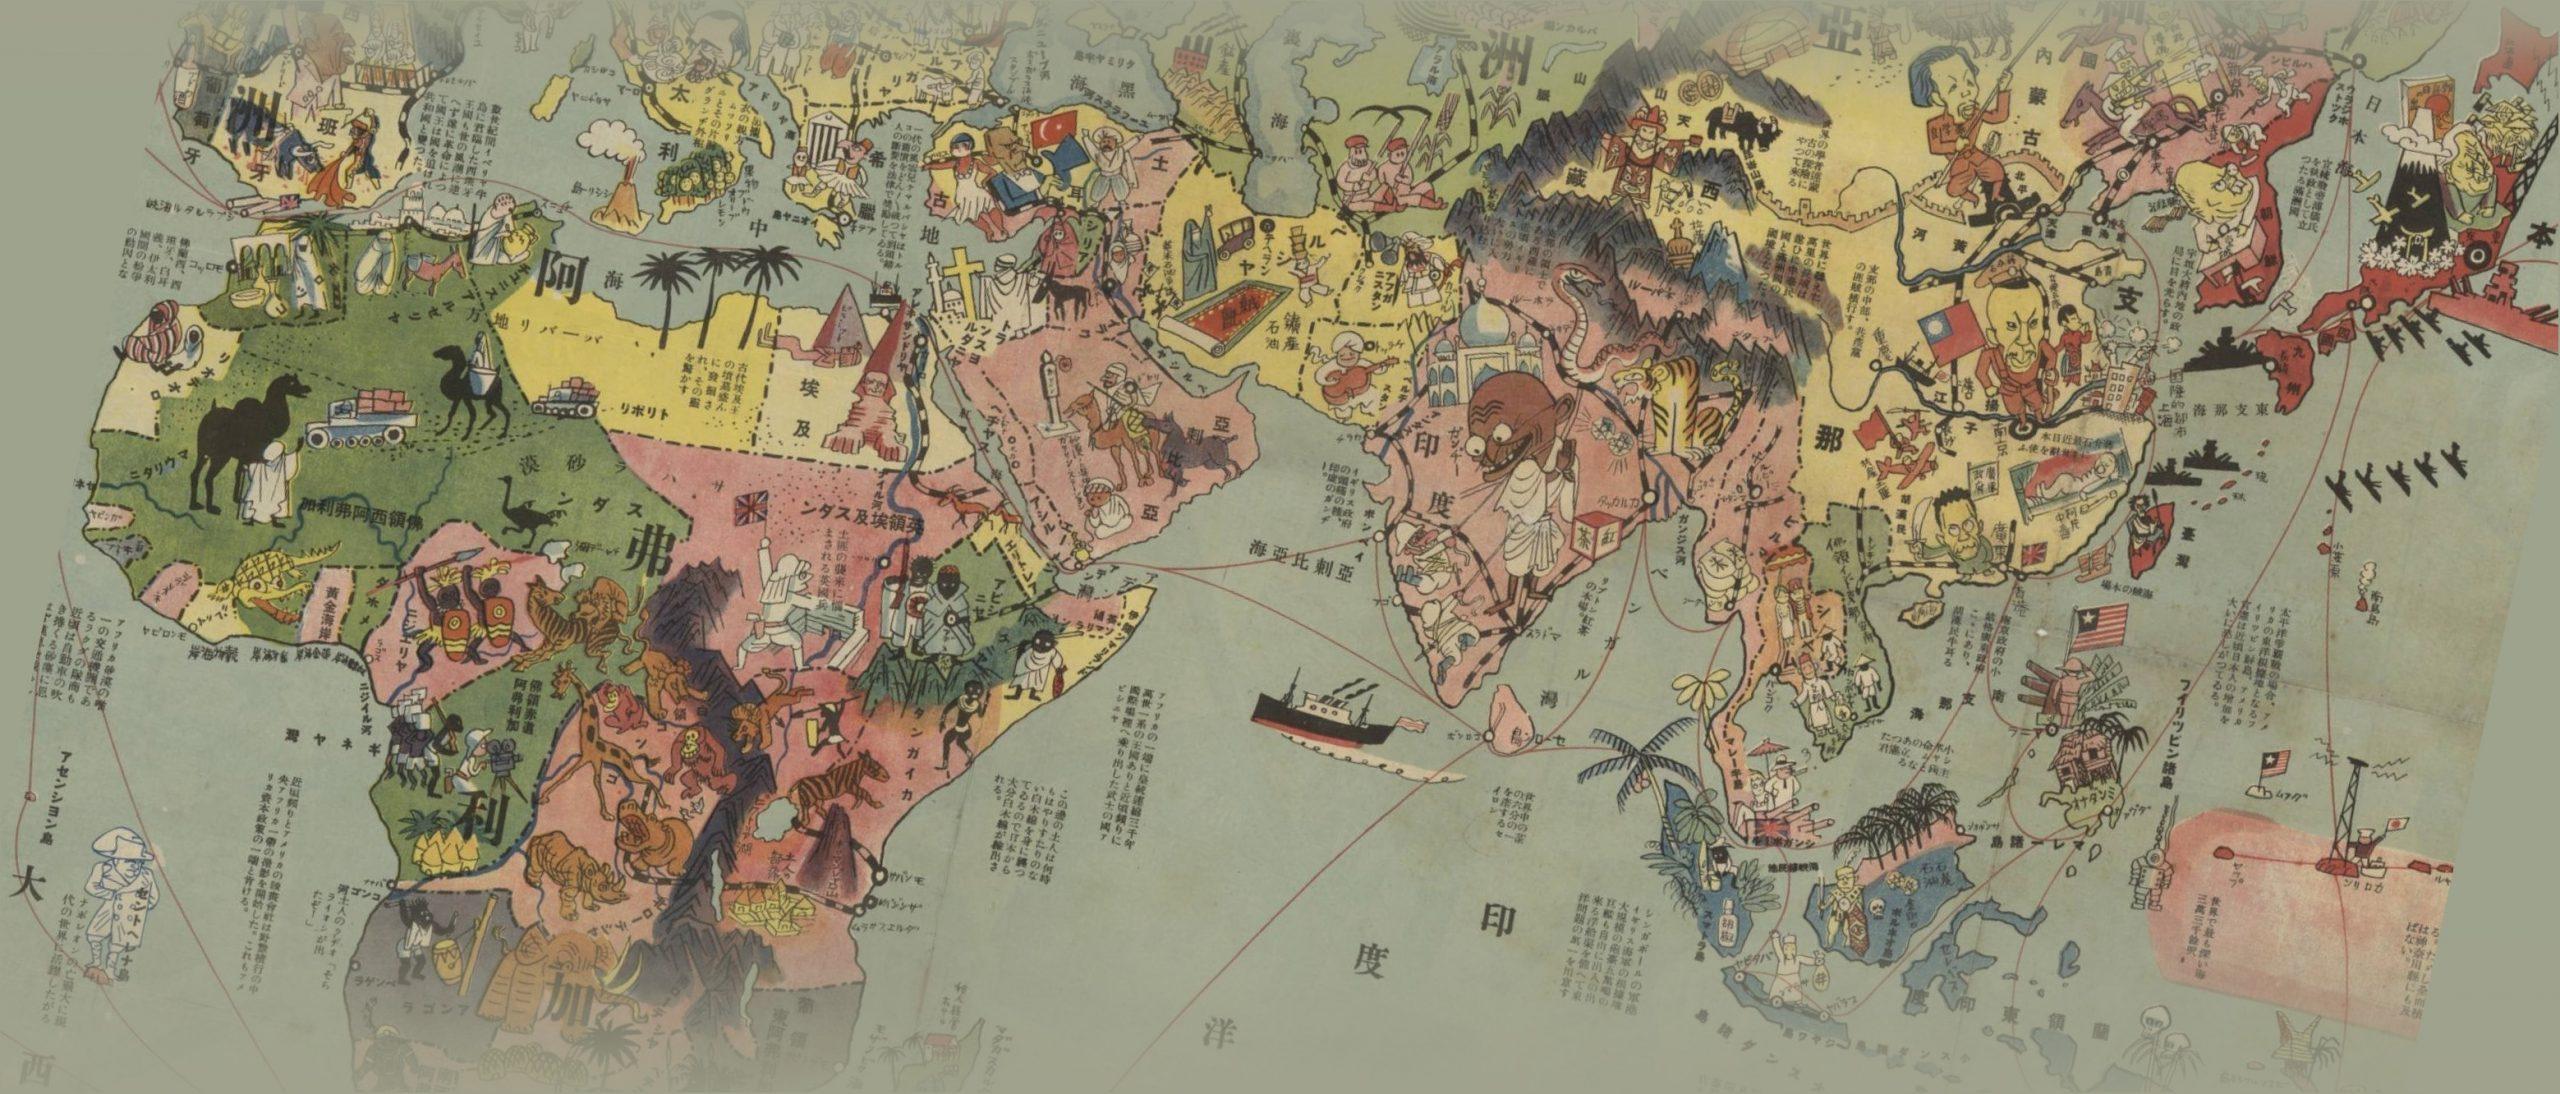 Understanding Alternative Histories: The Ethiopian Japaniser Movement